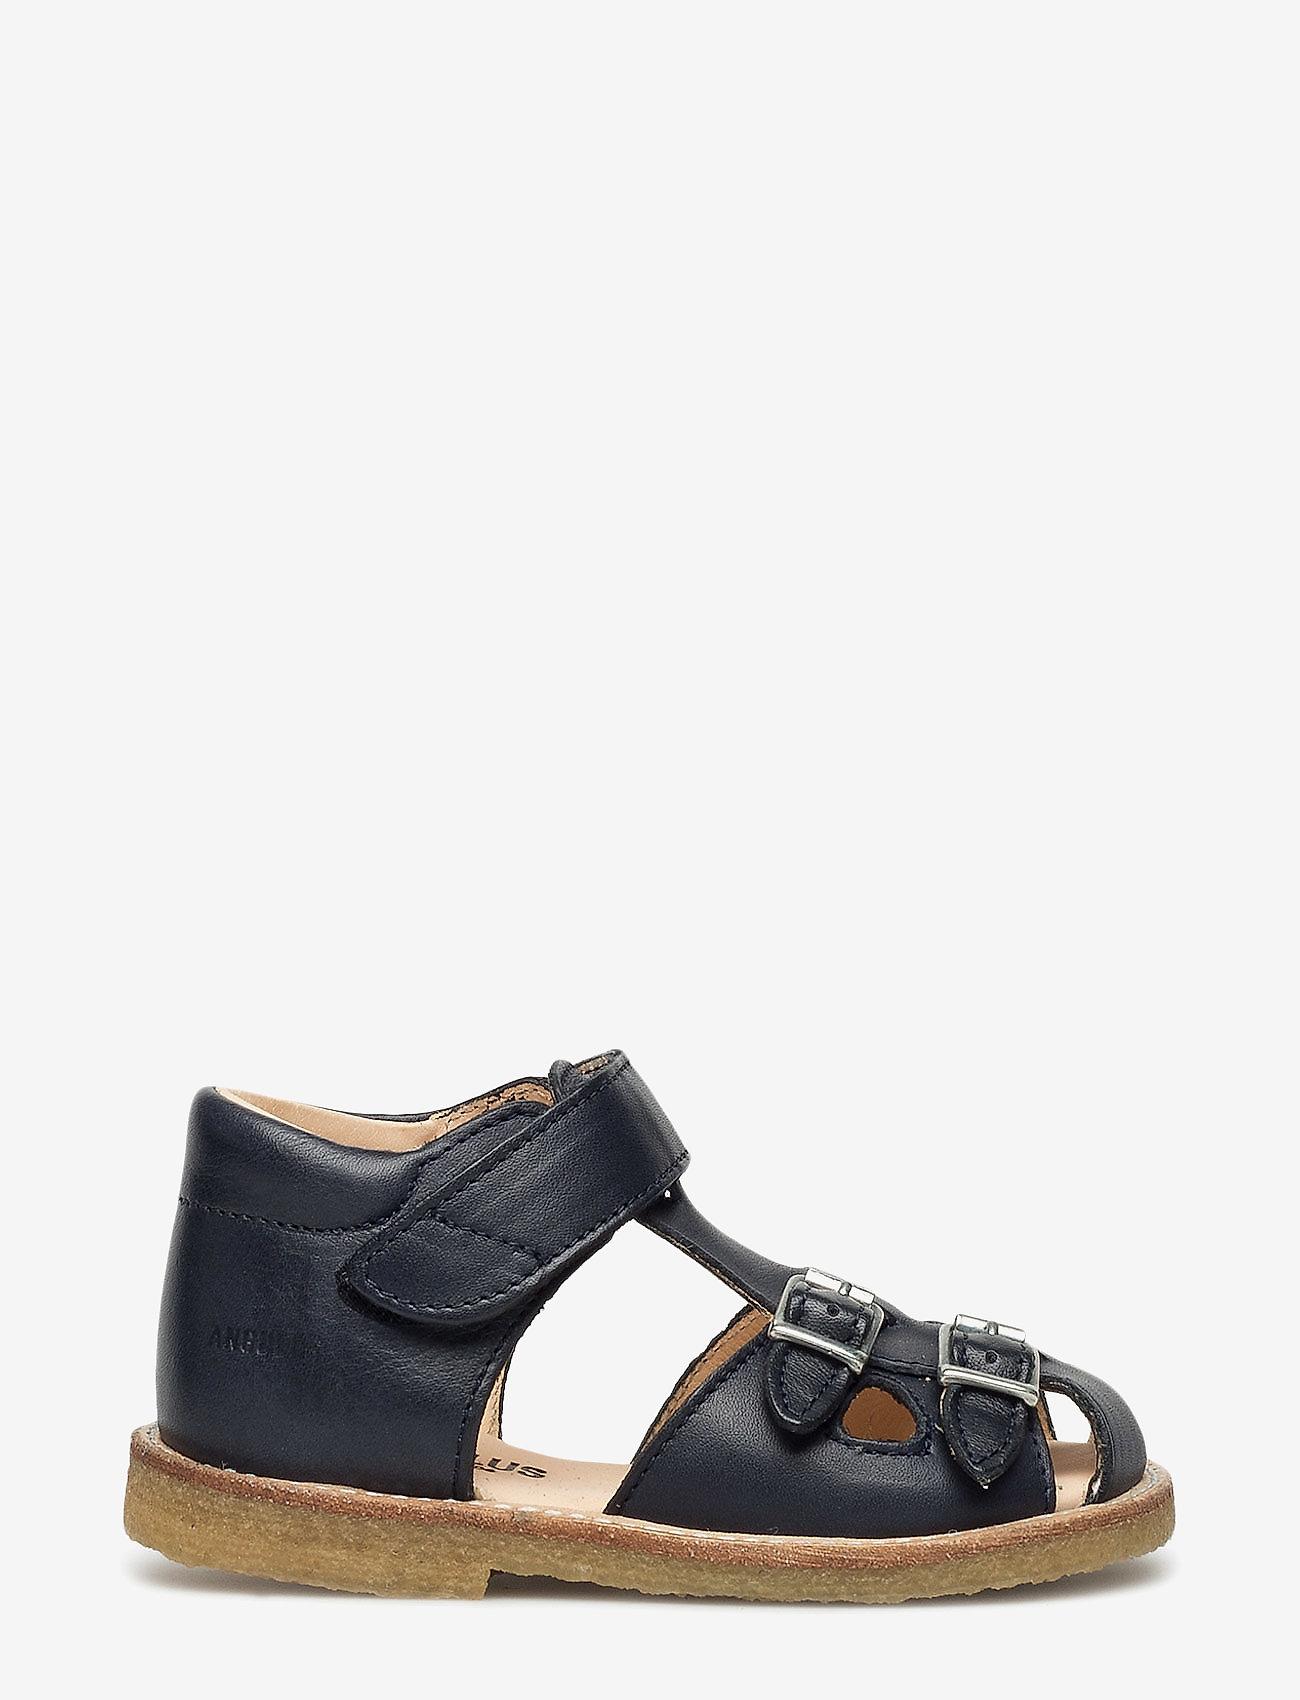 ANGULUS - Sandals - flat - sandals - 1530 navy - 1